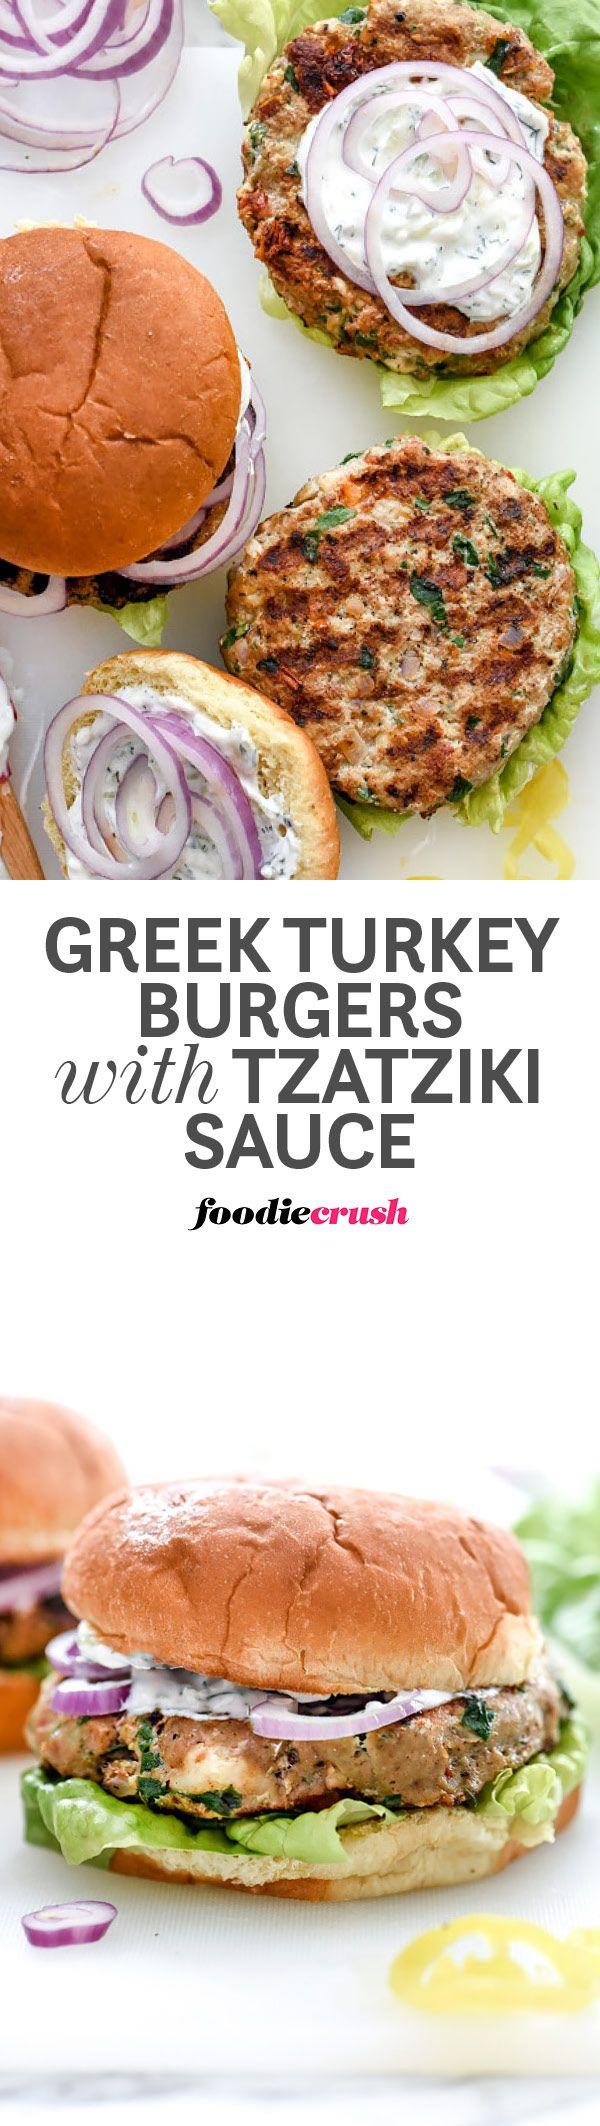 Turkey burgers made with the Greek flavors of garlic, oregano ...